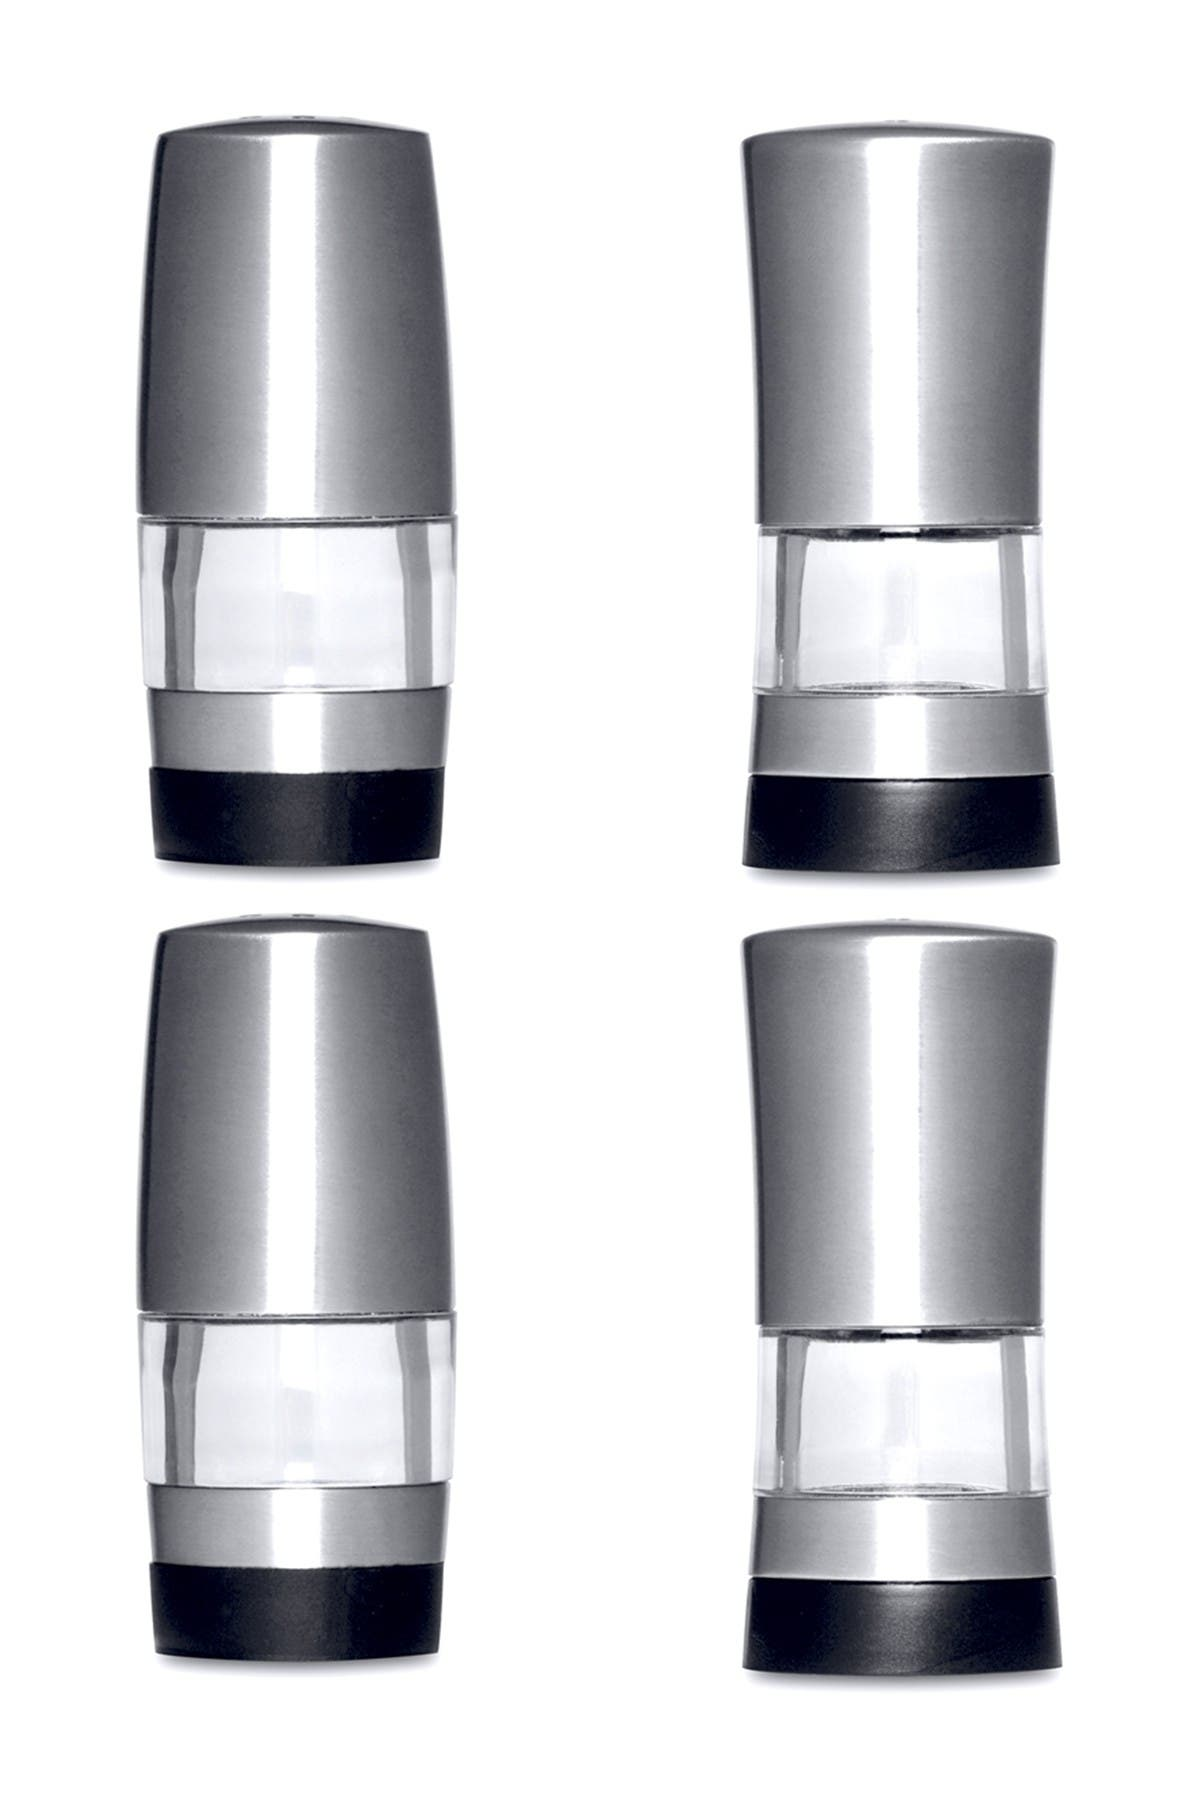 Image of BergHOFF Mini Salt and Pepper Dispensers - 2-Piece Set